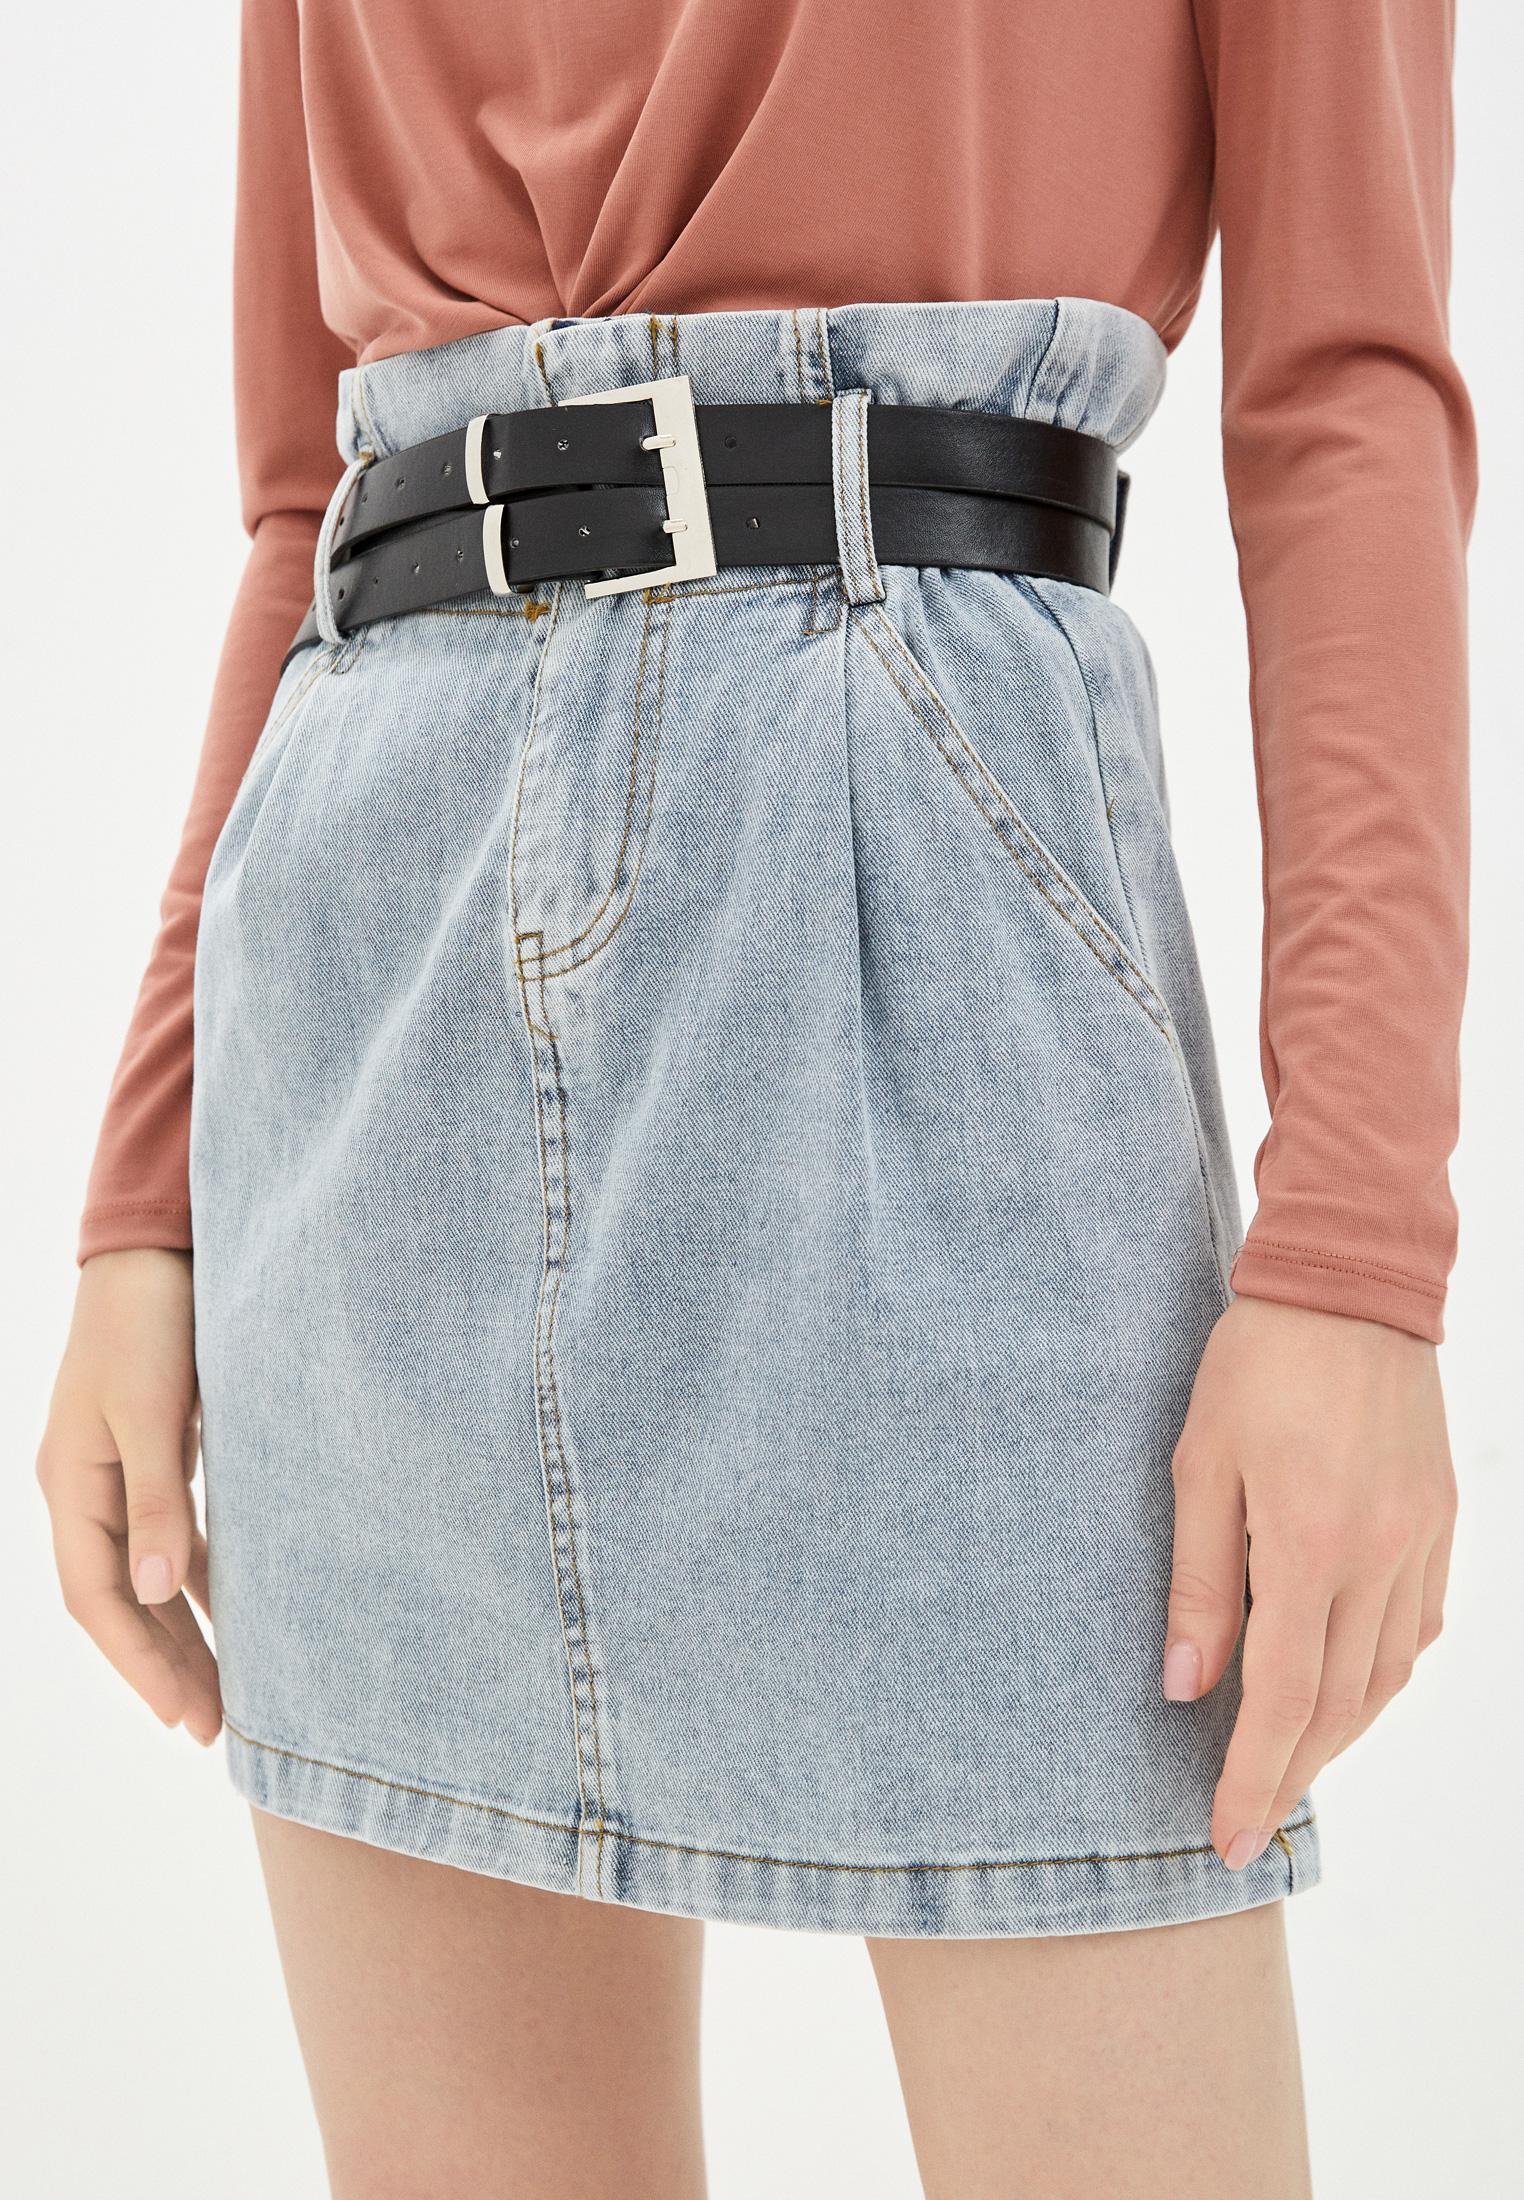 Джинсовая юбка Miss Gabby 5758